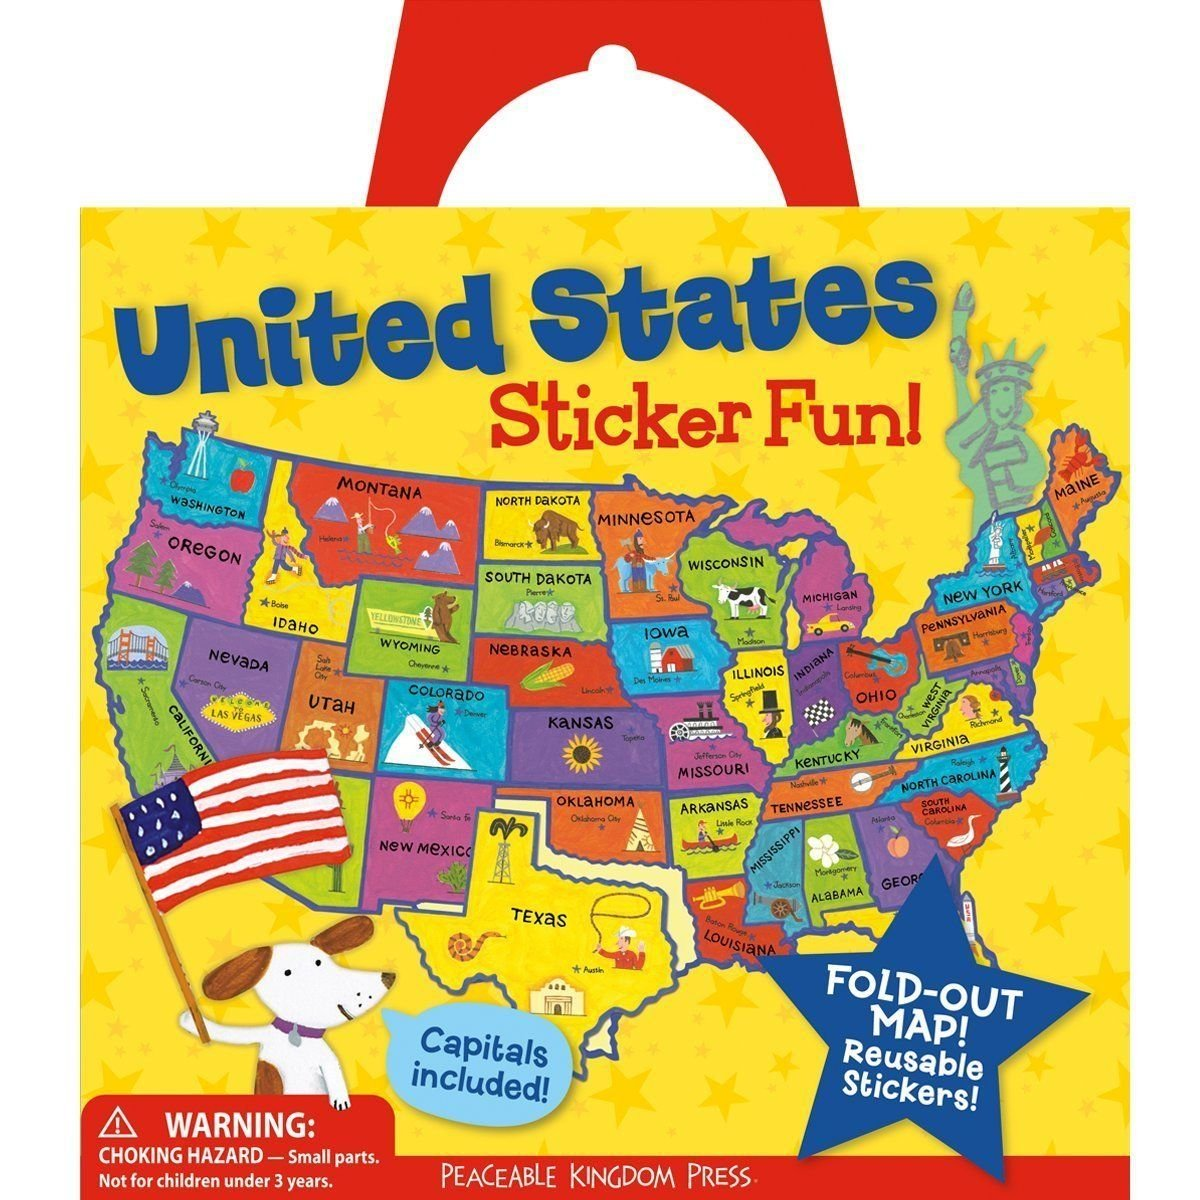 Peaceable Kingdom Award Winning Sticker Fun United States Reusable Sticker Tote SP38